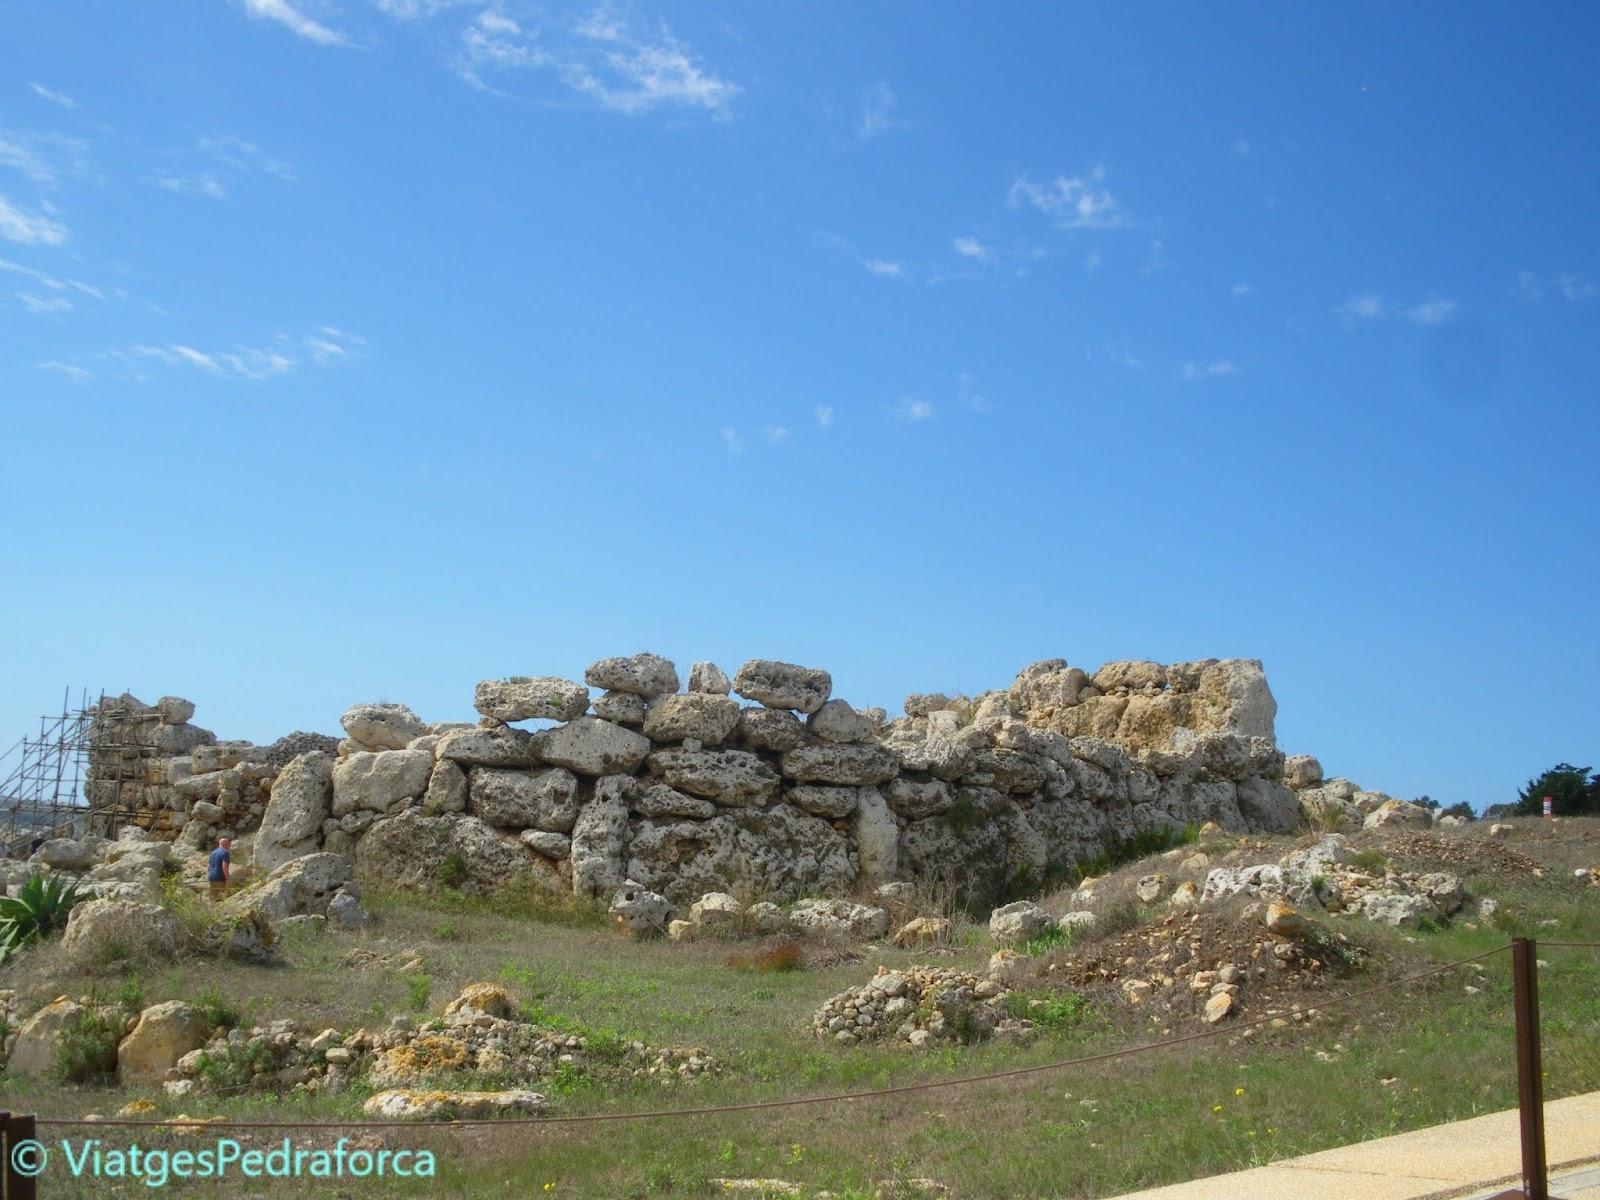 Arqueologia, Malta, patrimoni de la humanitat, Unesco heritage site